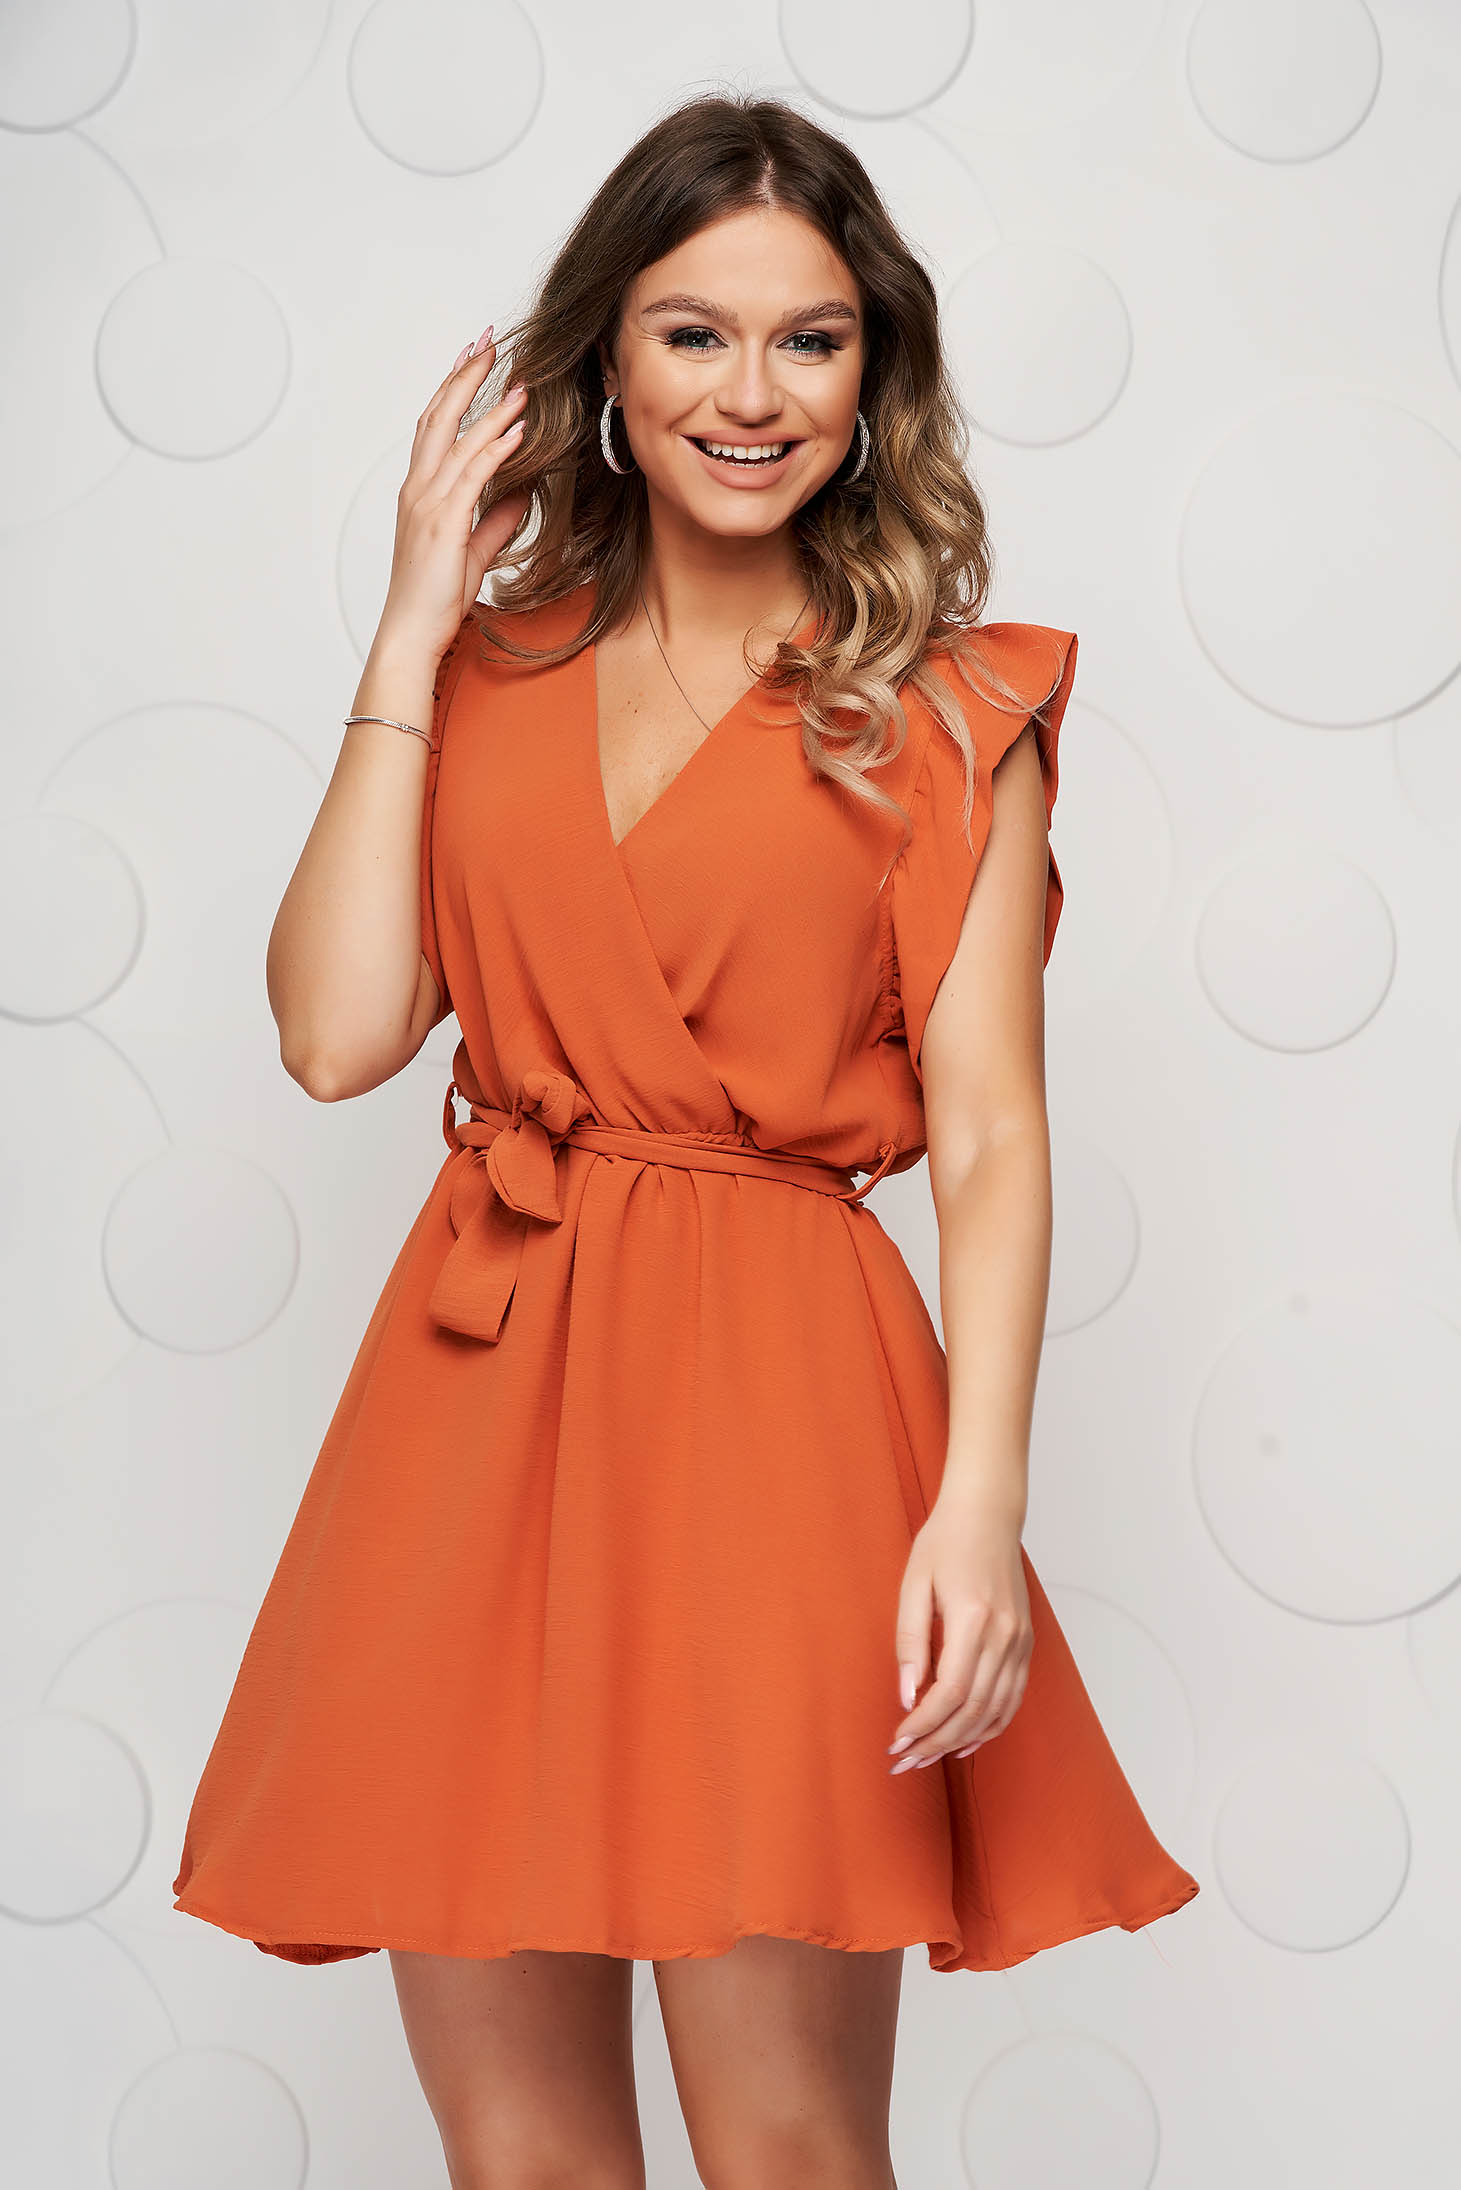 Bricky dress short cut daily elegant sleeveless thin fabric